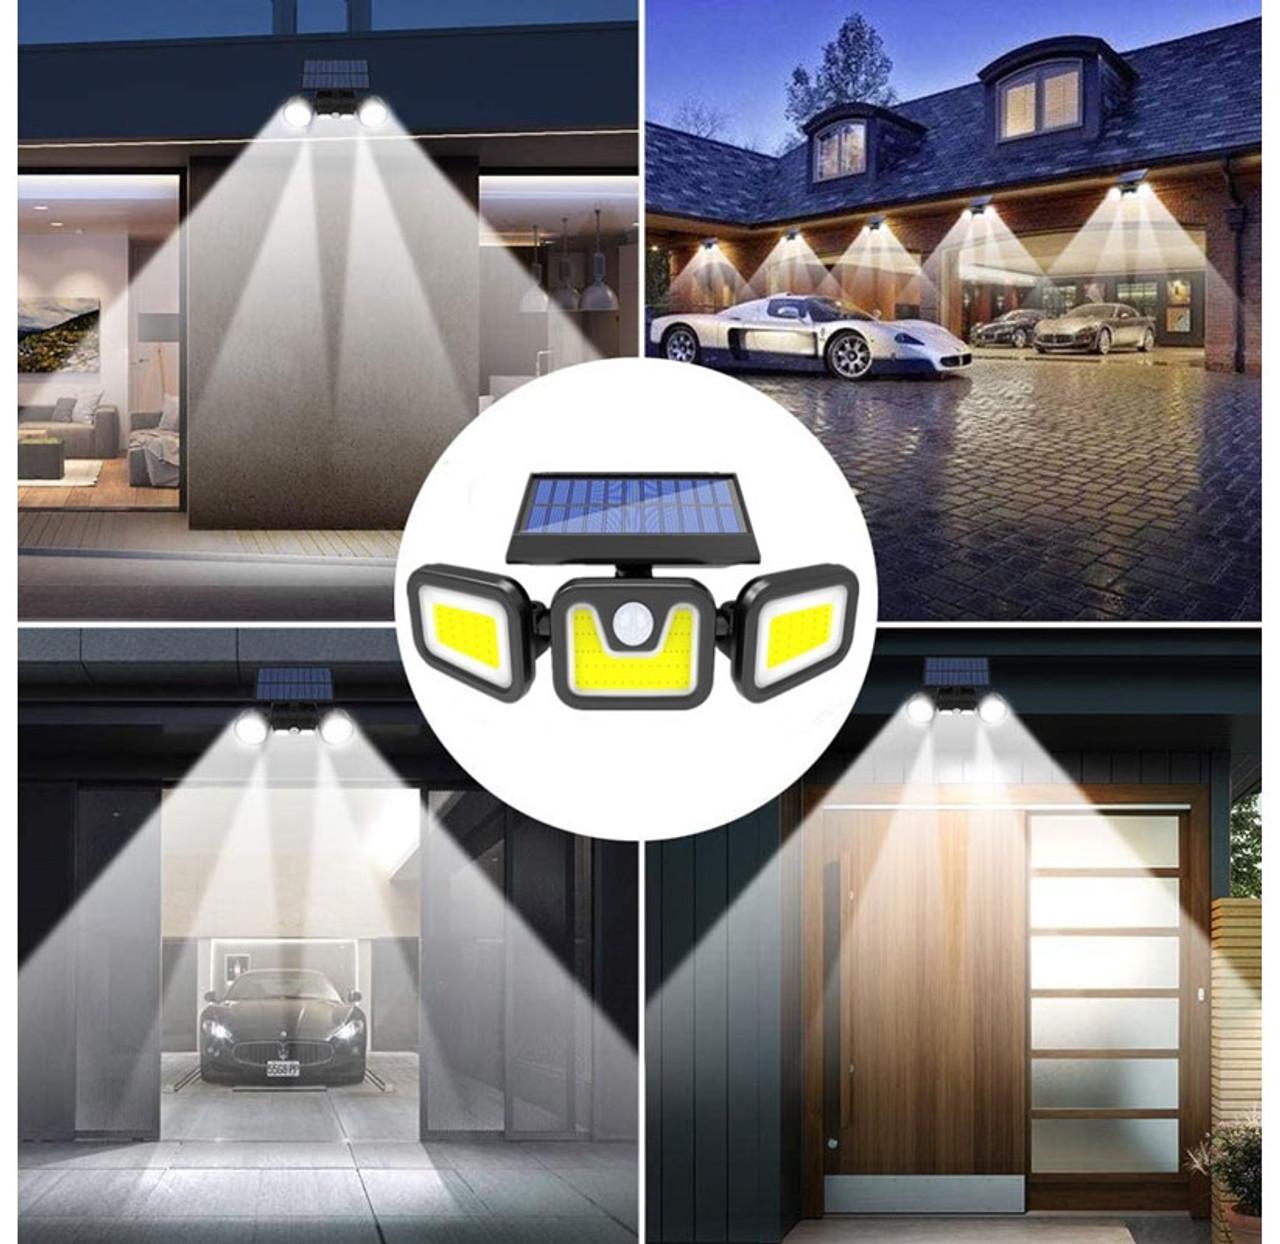 Solar 3-Head Rotatable Split Motion Sensor Lamp $25.99 (71% OFF)